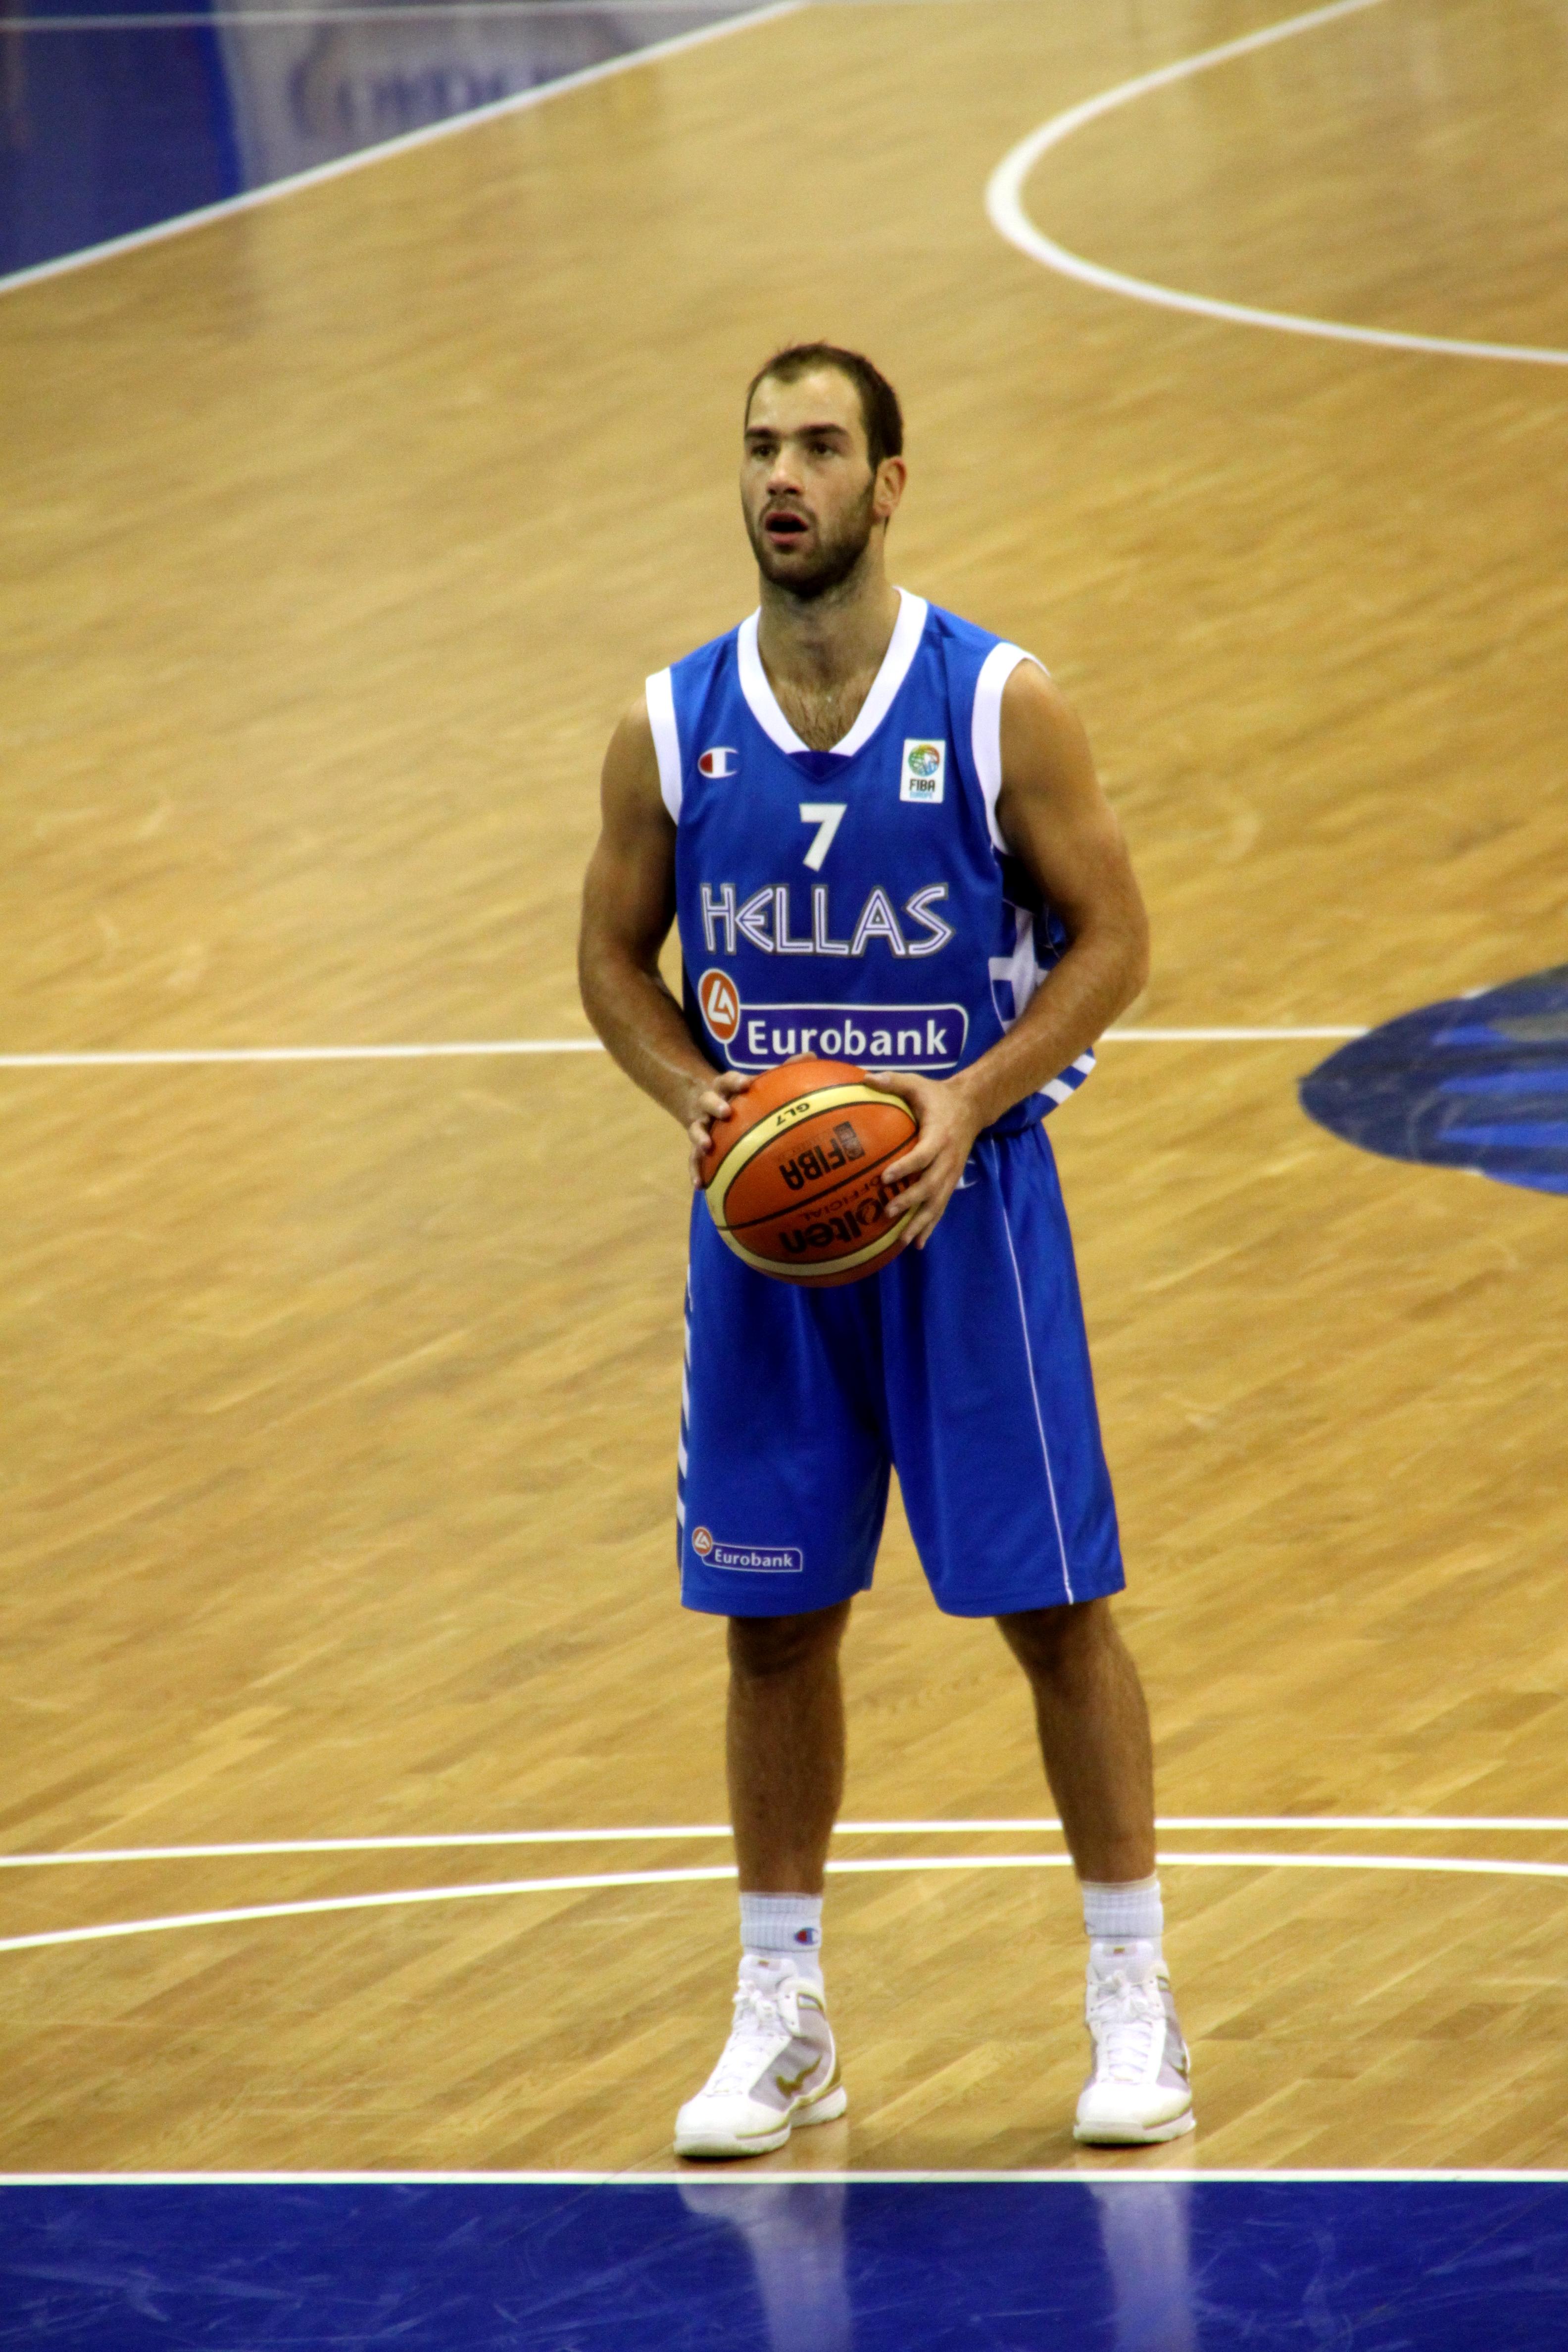 Basketball Shoes Poland